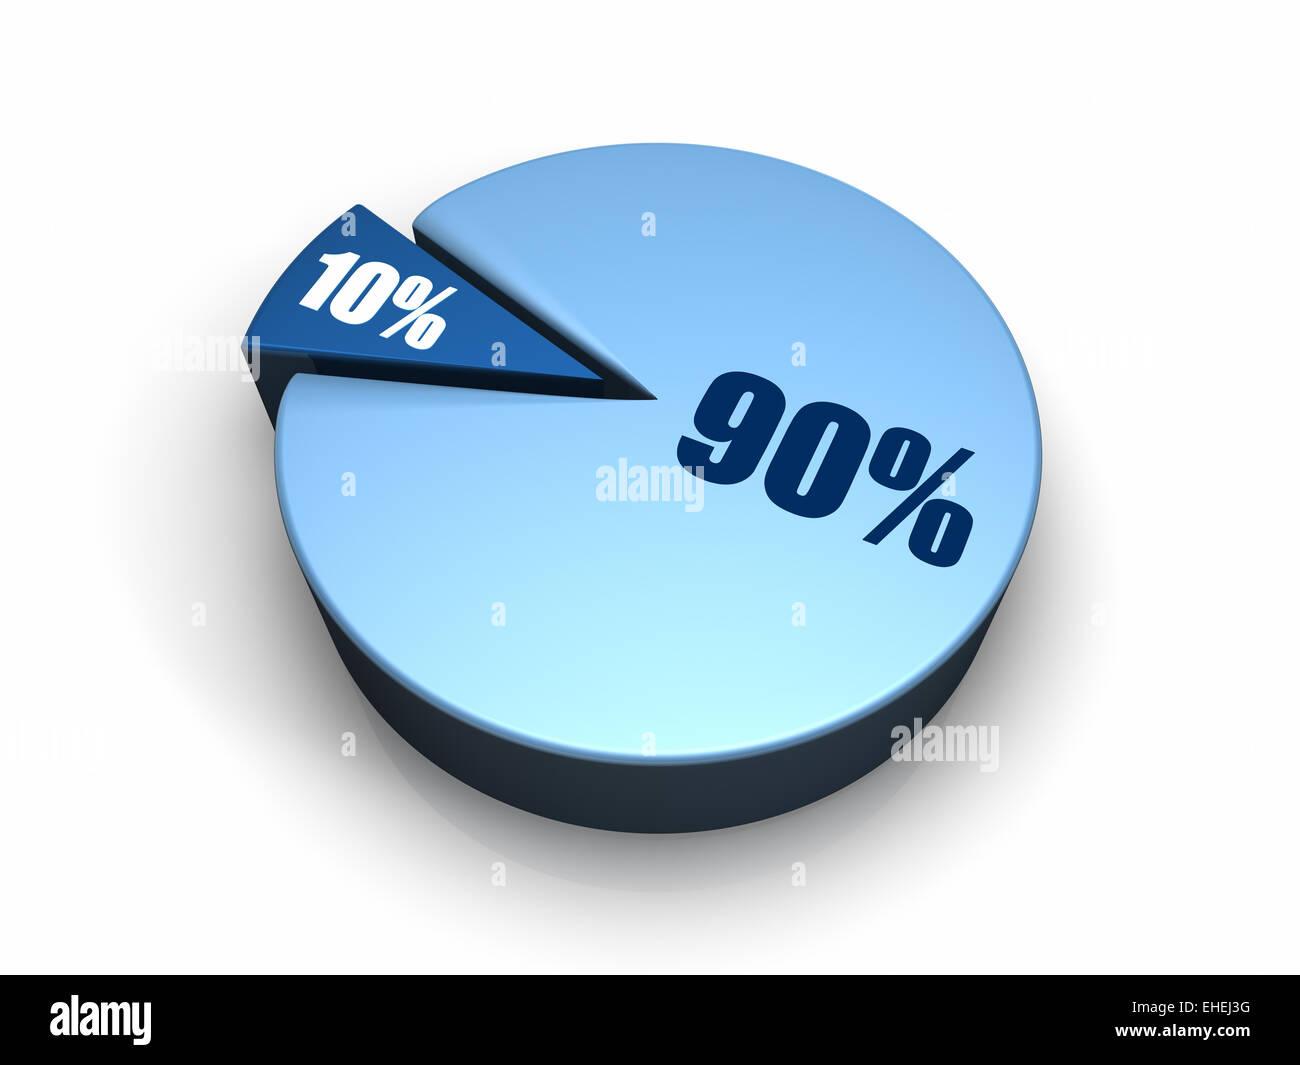 Pie Chart 90 10 Percent Stock Photos Pie Chart 90 10 Percent Stock